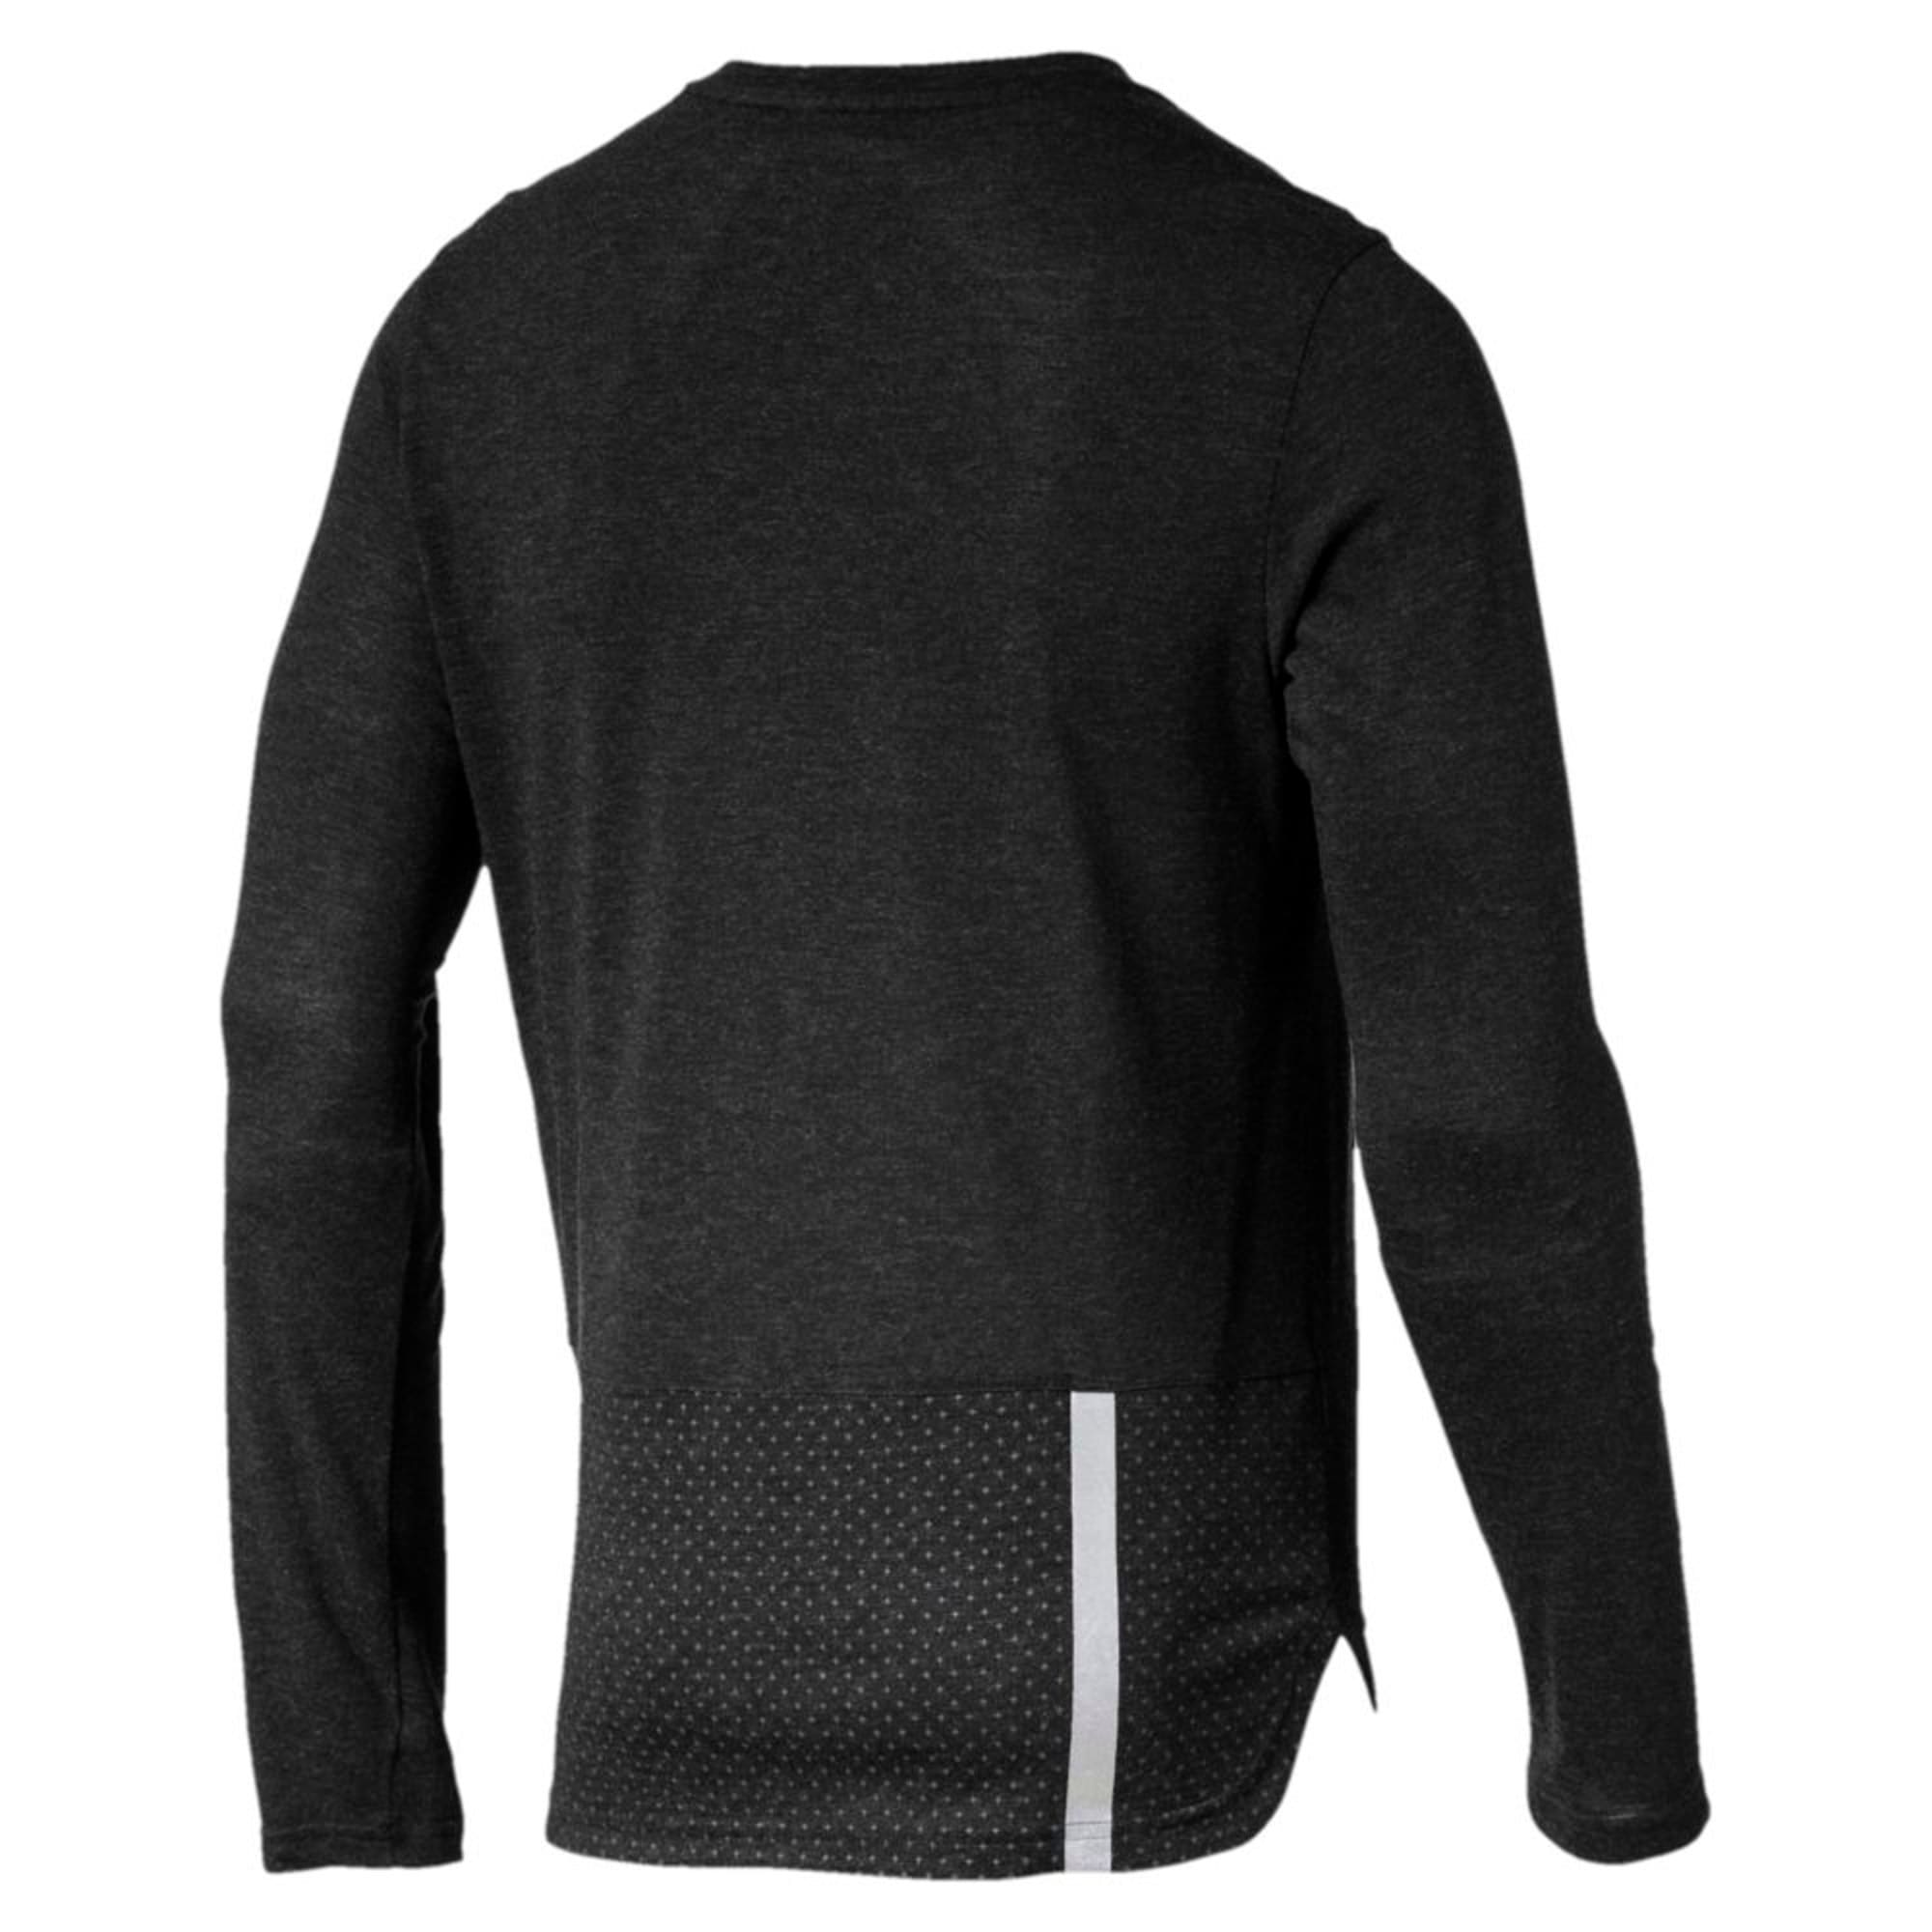 Thumbnail 2 of Warming Long Sleeve Men's Training Top, Puma Black Heather, medium-IND